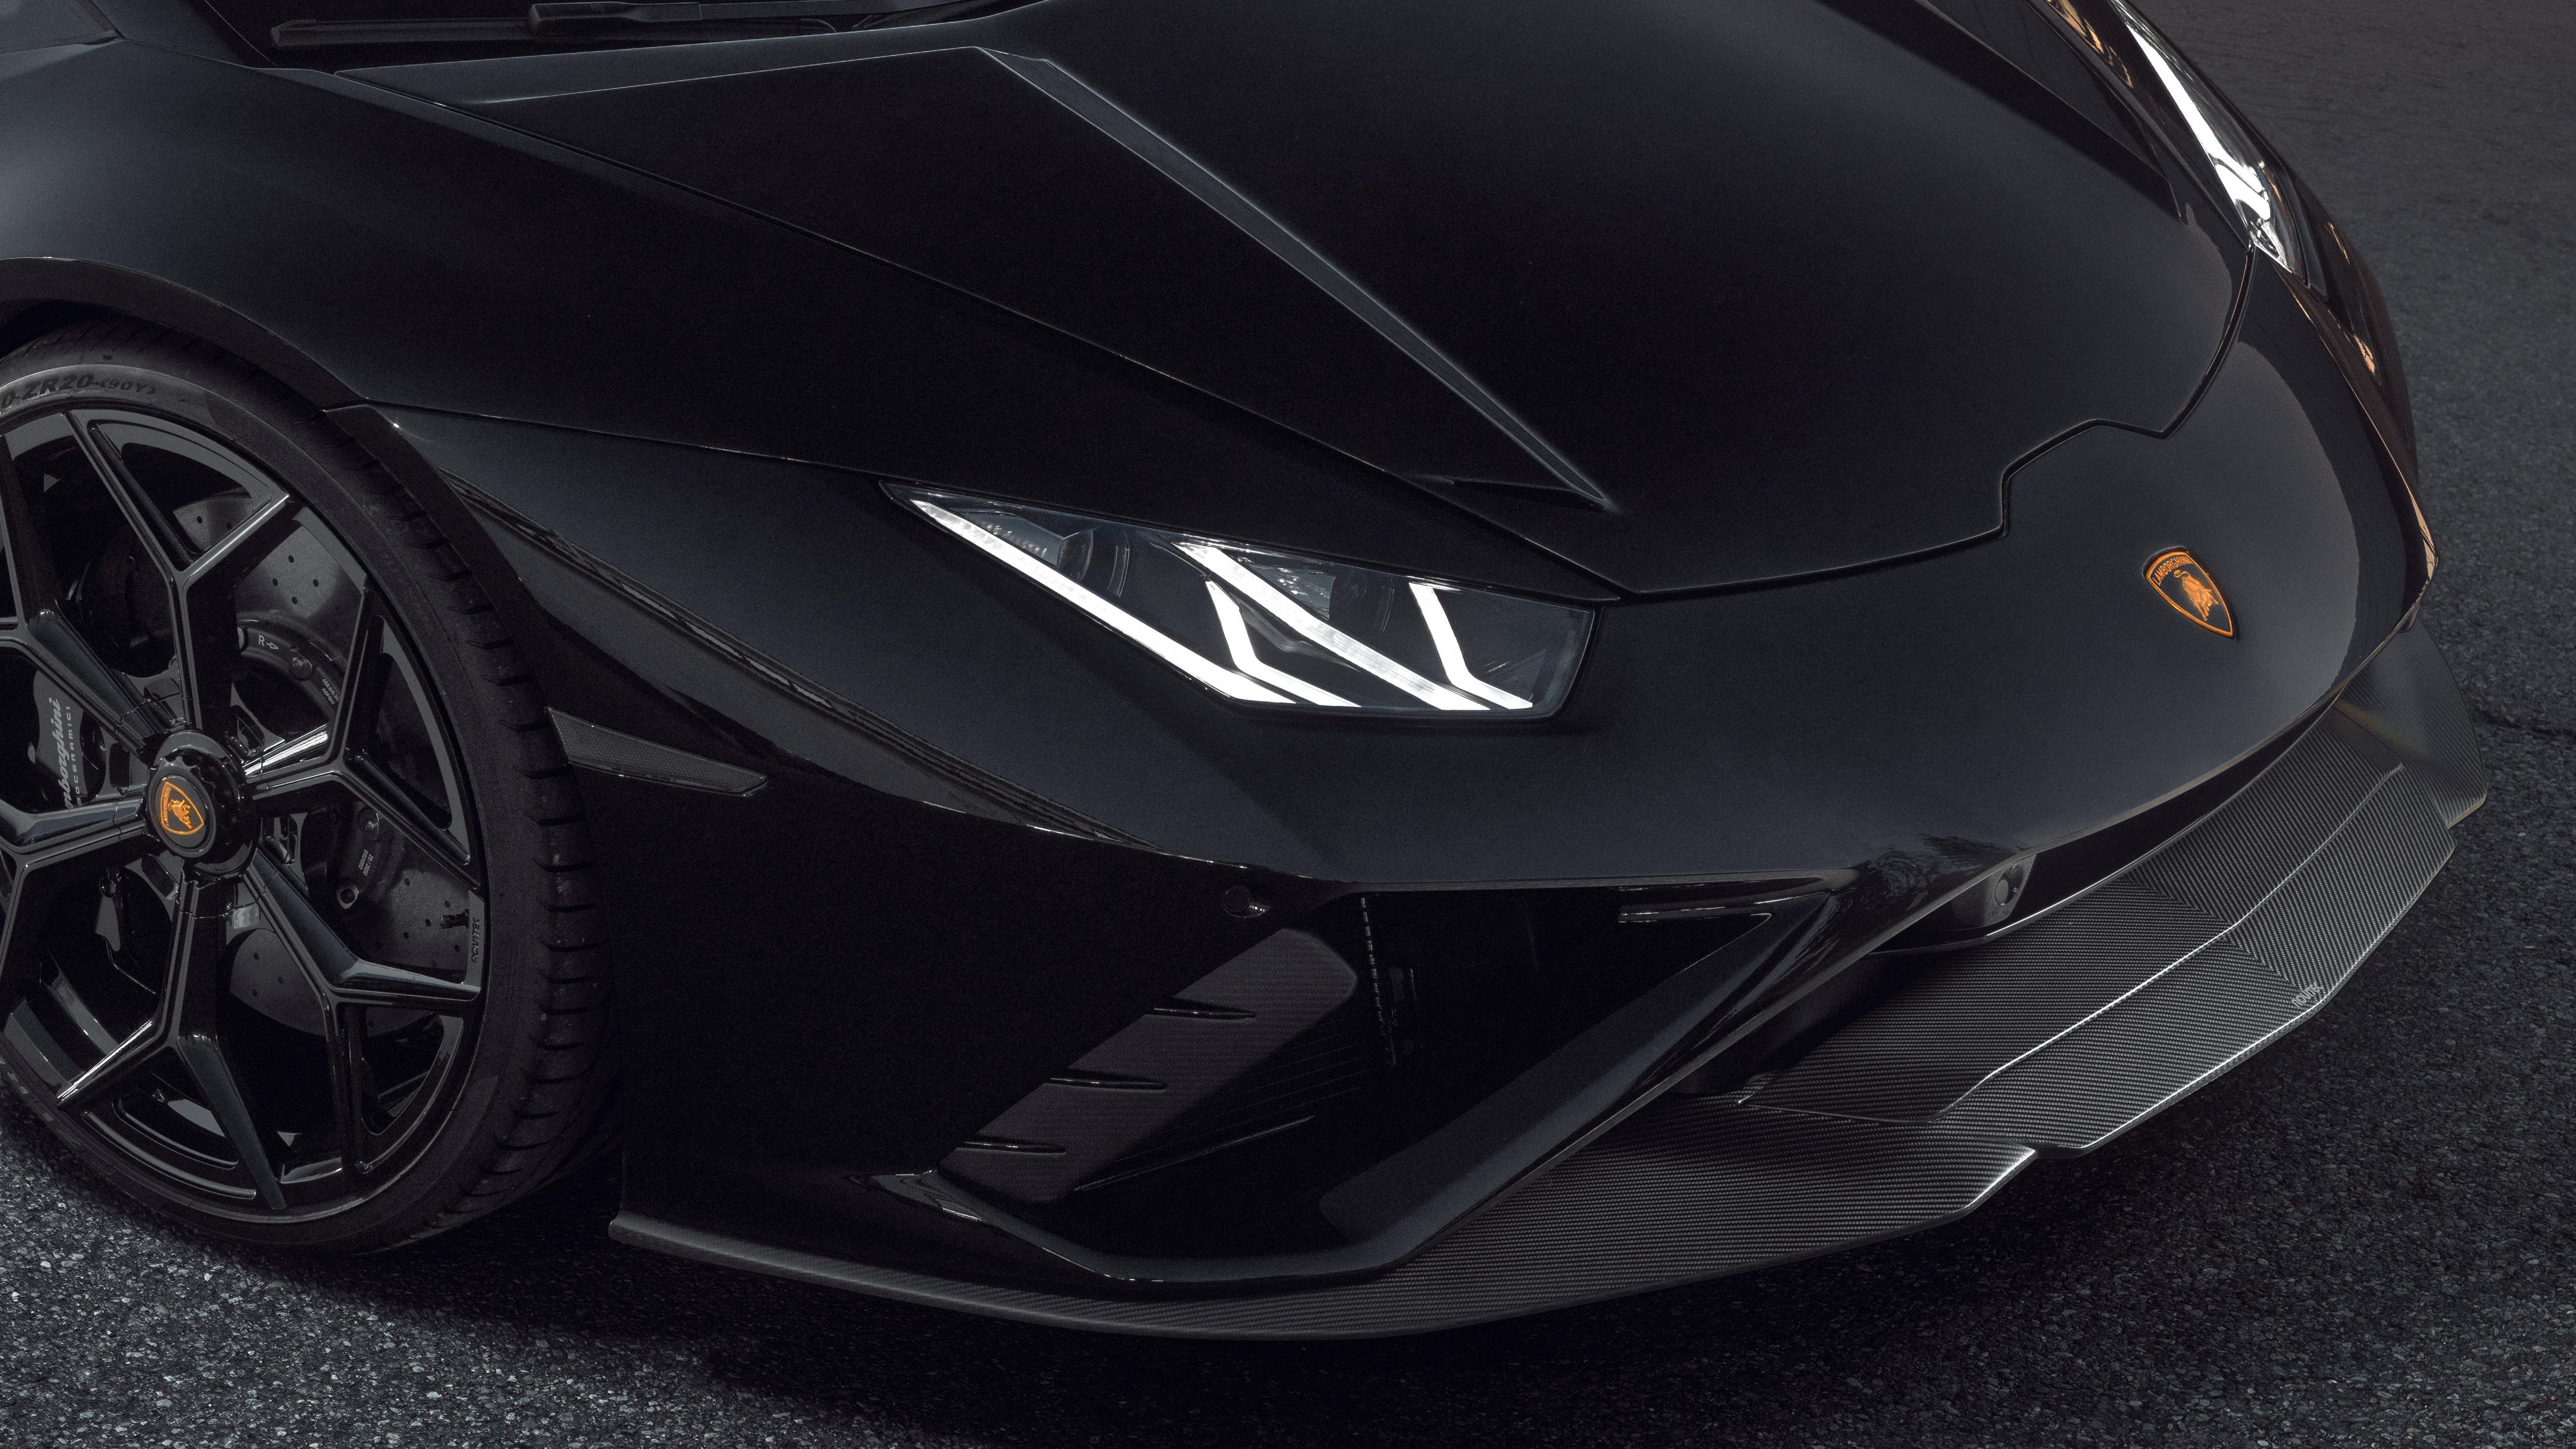 novitec lamborghini huracan evo headlights front look 4k 1620167313 - Novitec Lamborghini Huracan Evo Headlights Front Look 4k - Novitec Lamborghini Huracan Evo Headlights Front Look 4k wallpapers